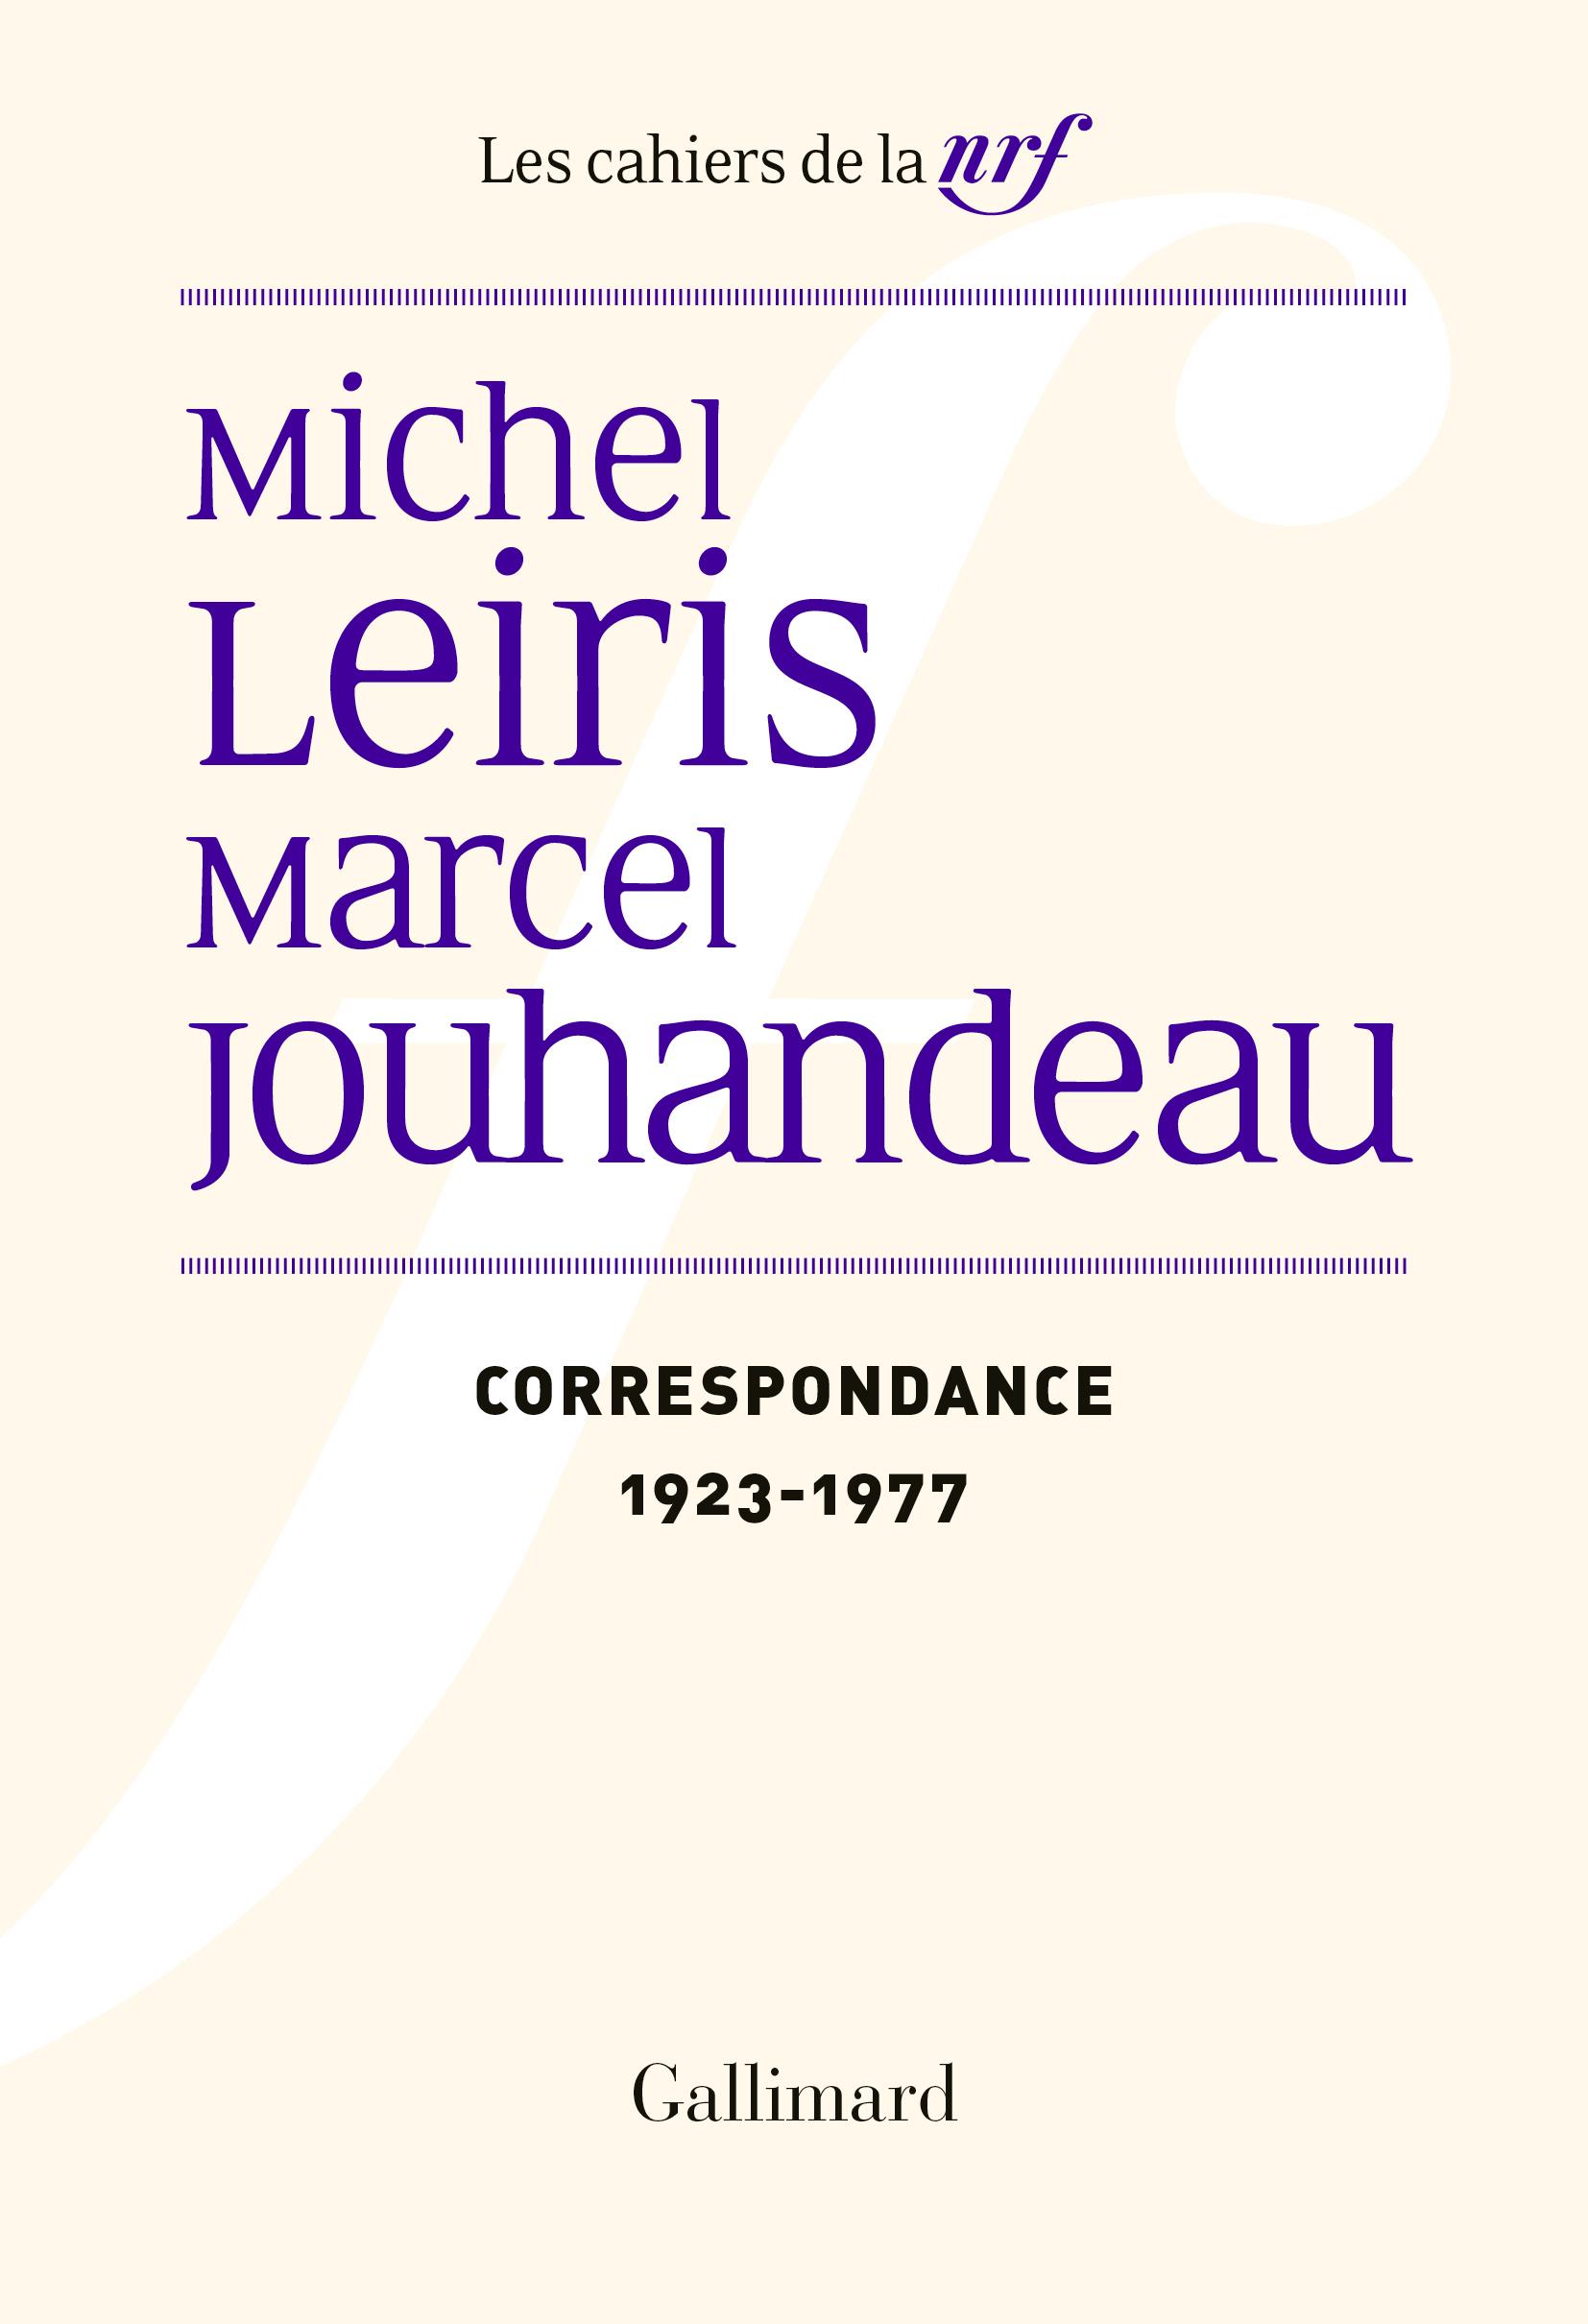 M. Jouhandeau, M. Leiris,Correspondance (1923-1977)